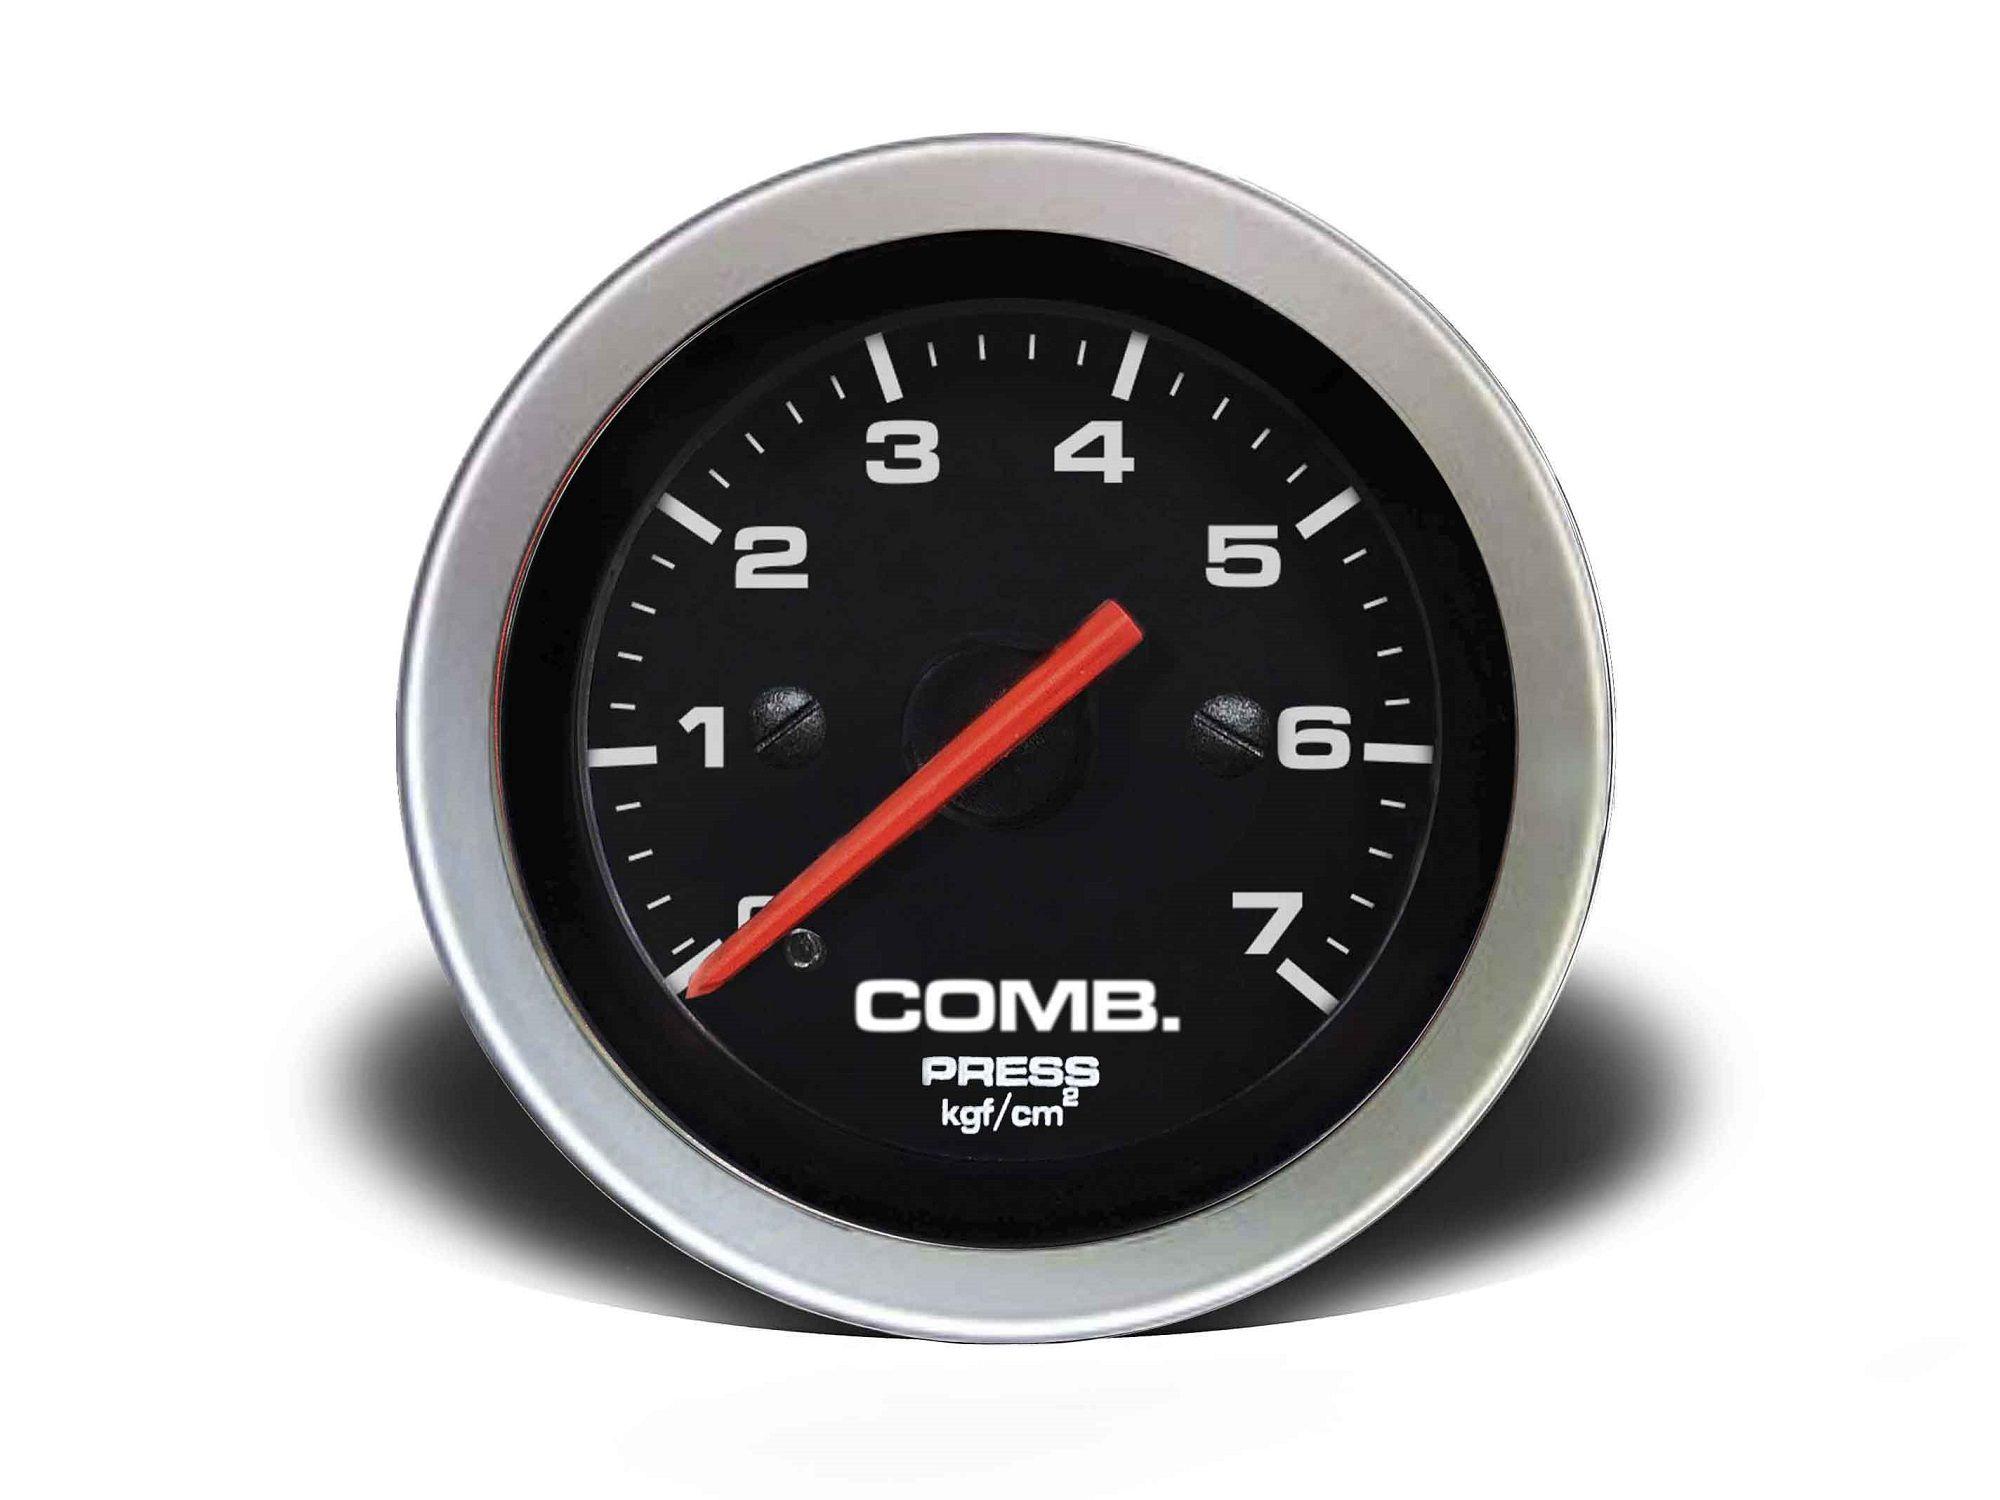 Relogio Pressao de Comb. 7kg Sport 52mm Cronomac